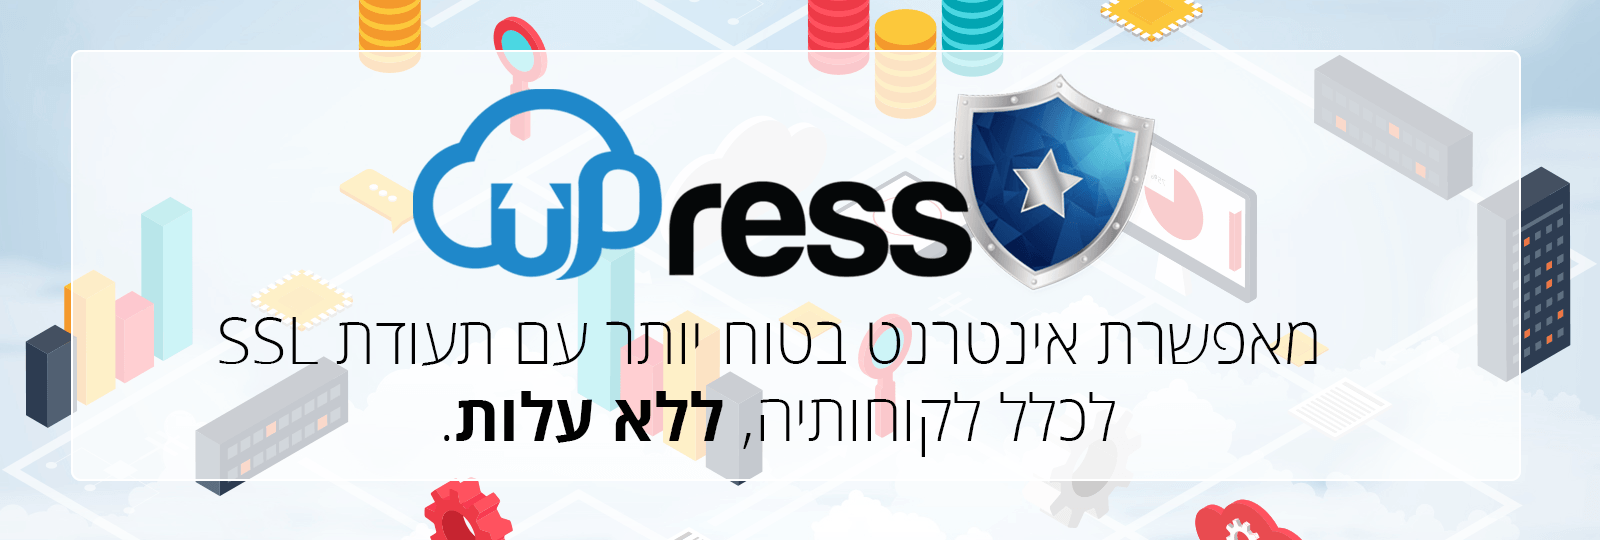 uPress מאפשרת אינטרנט בטוח יותר עם תעודת SSL ללא עלות